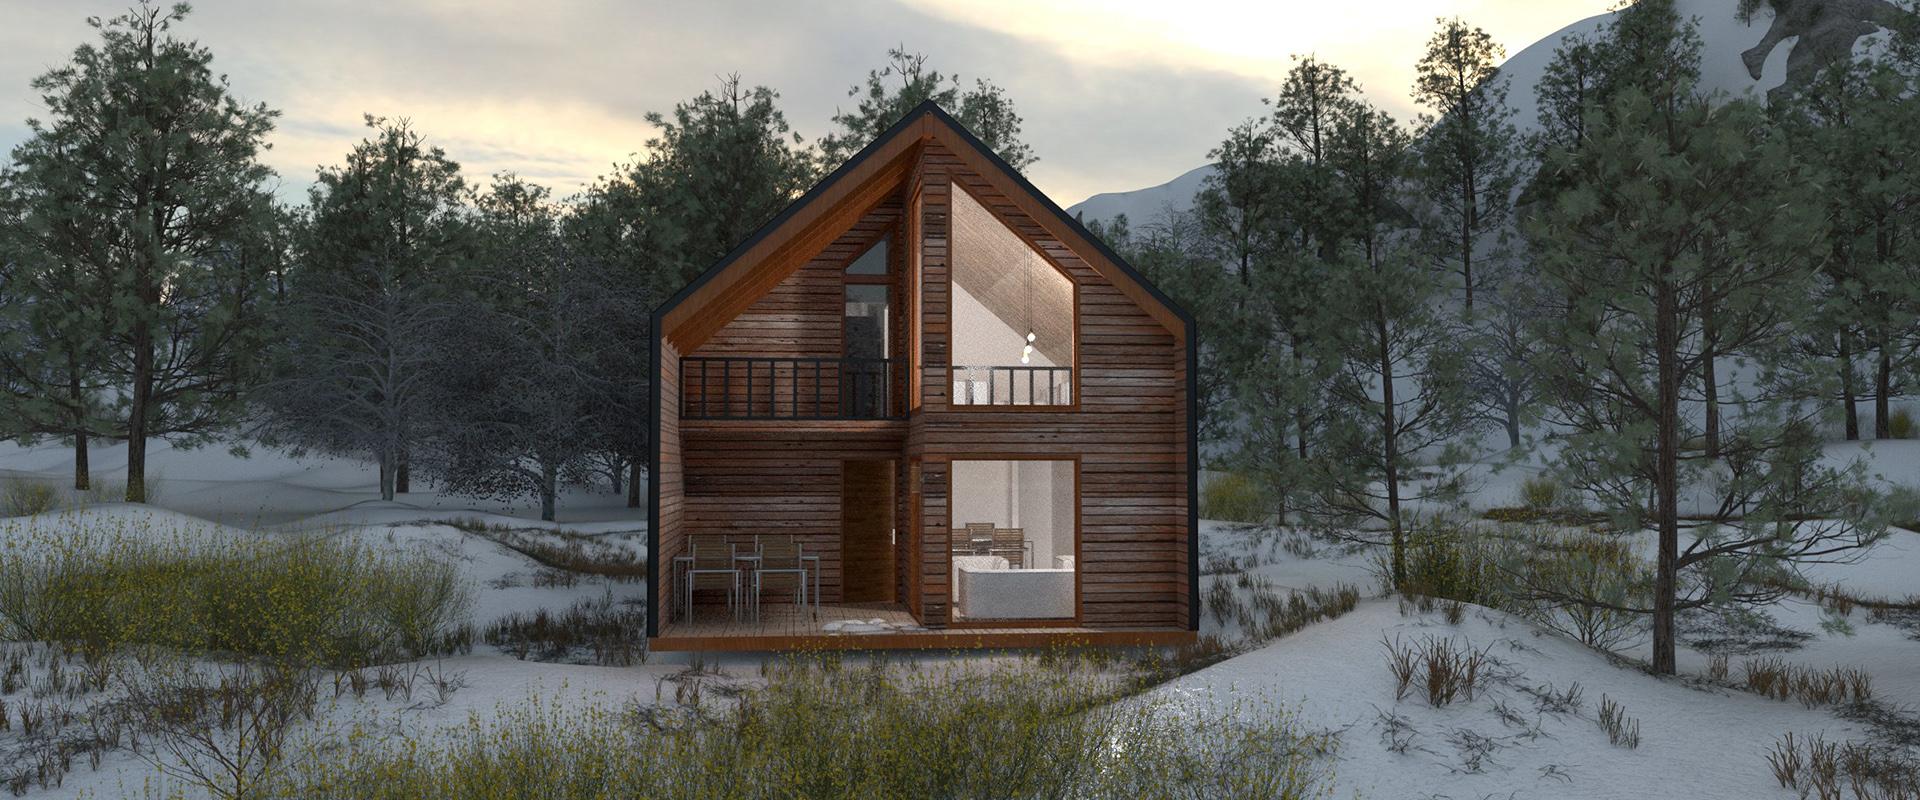 Casas Prefabricadas Malalcahuello